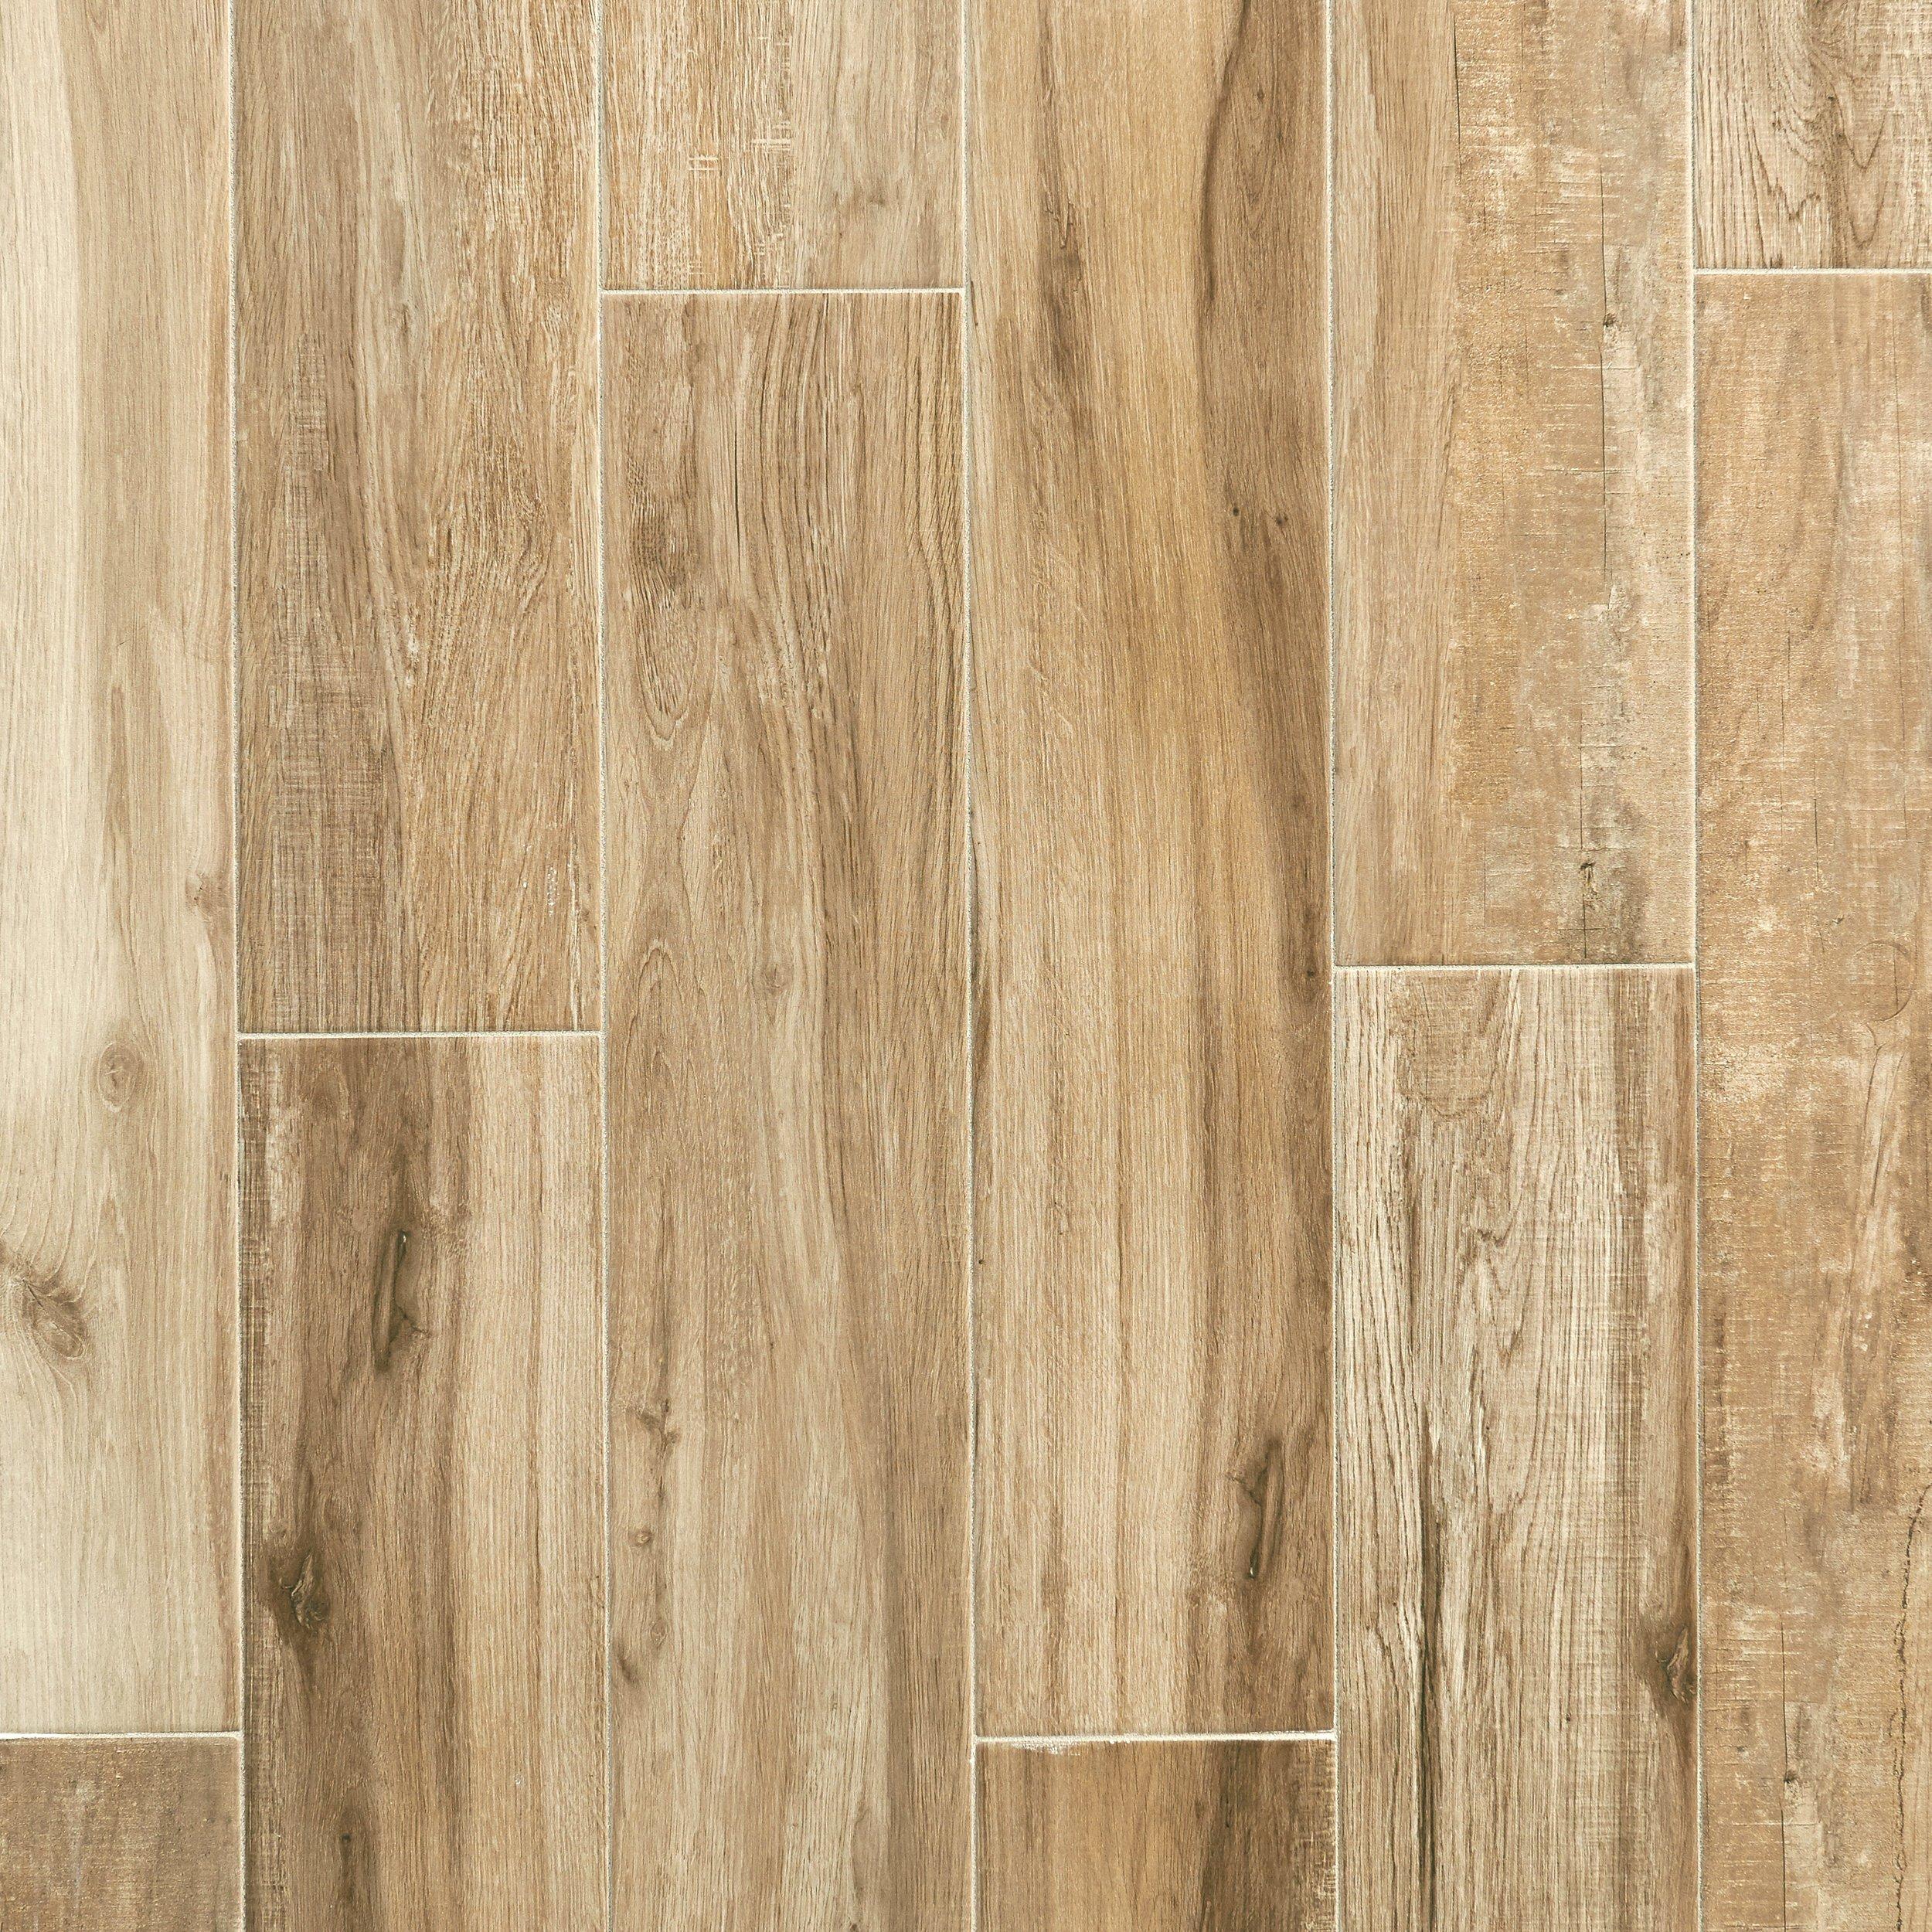 wood wooden flooring hardwood free images pattern planks parquet photo laminate stain floor structure en brown texture wallpaper